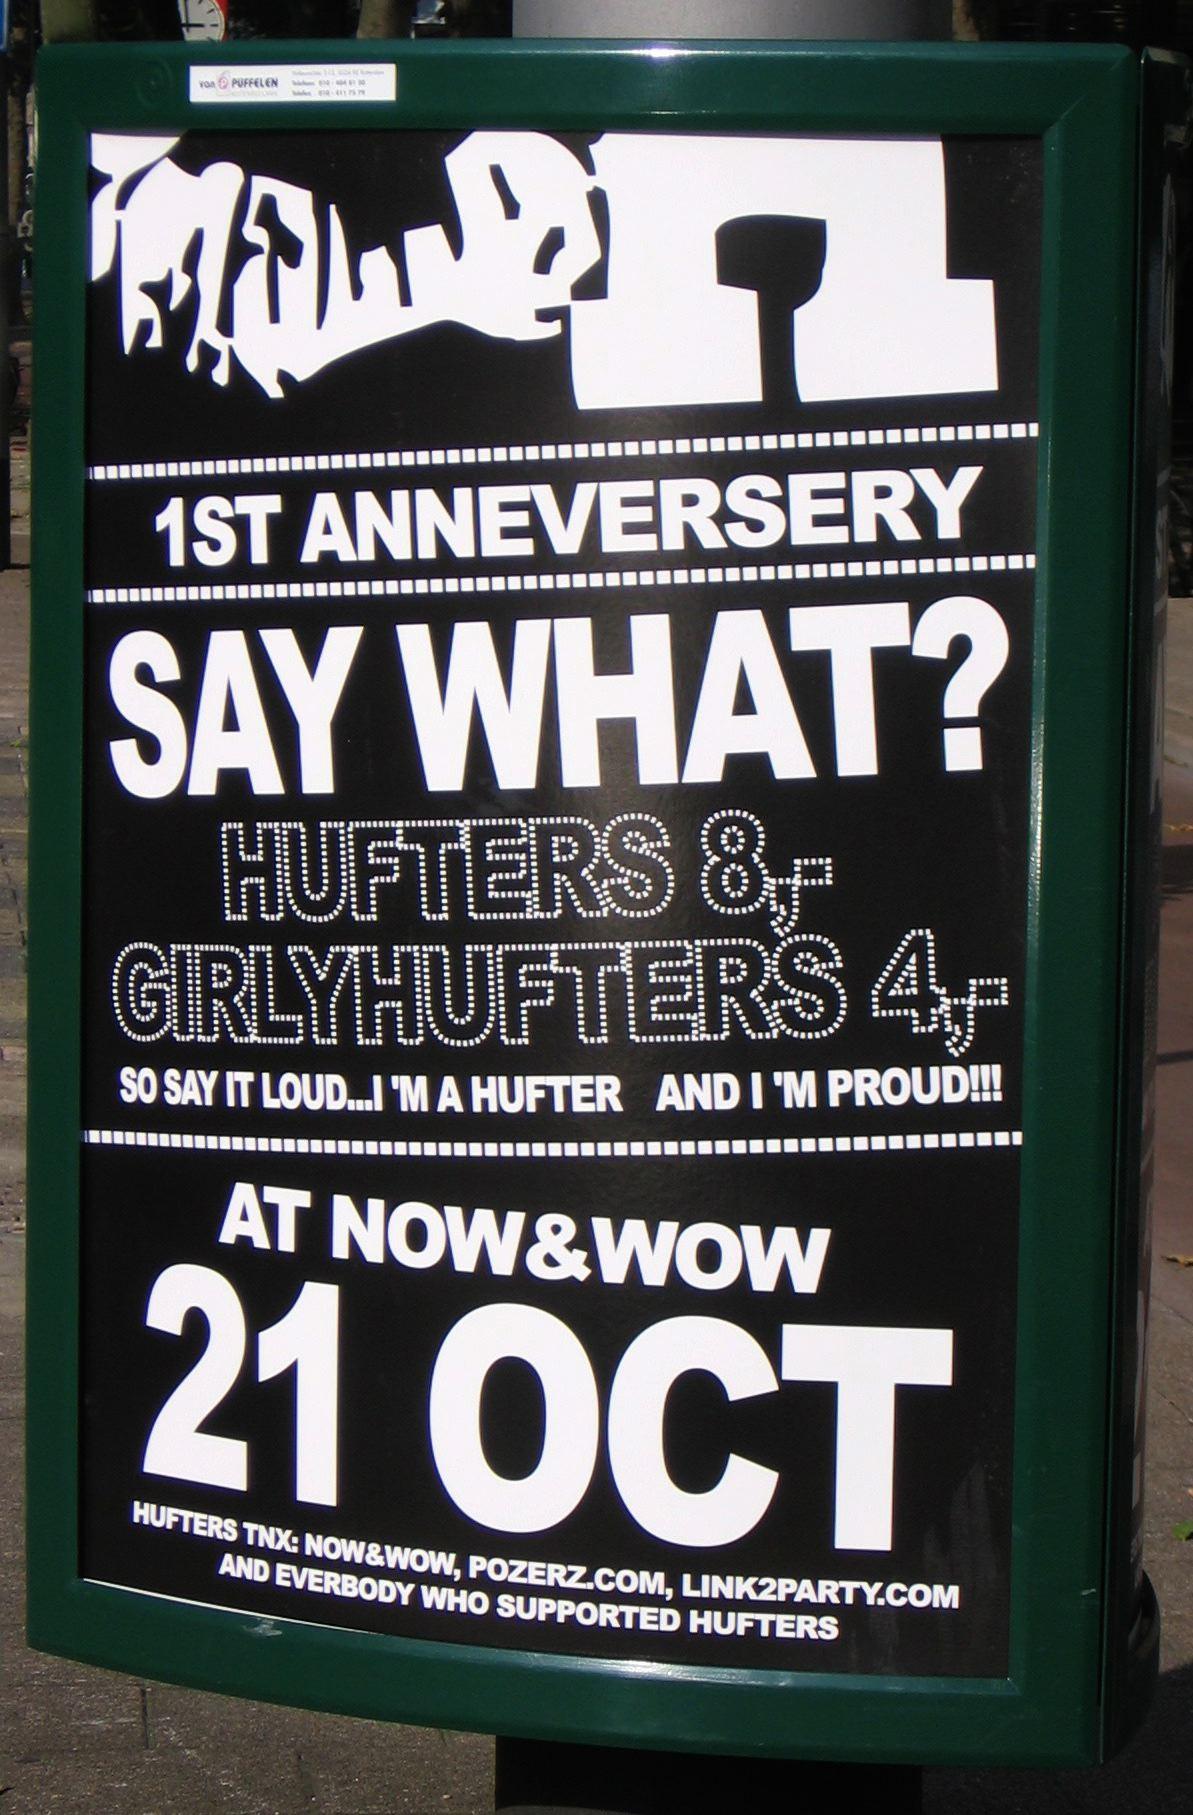 Club advert